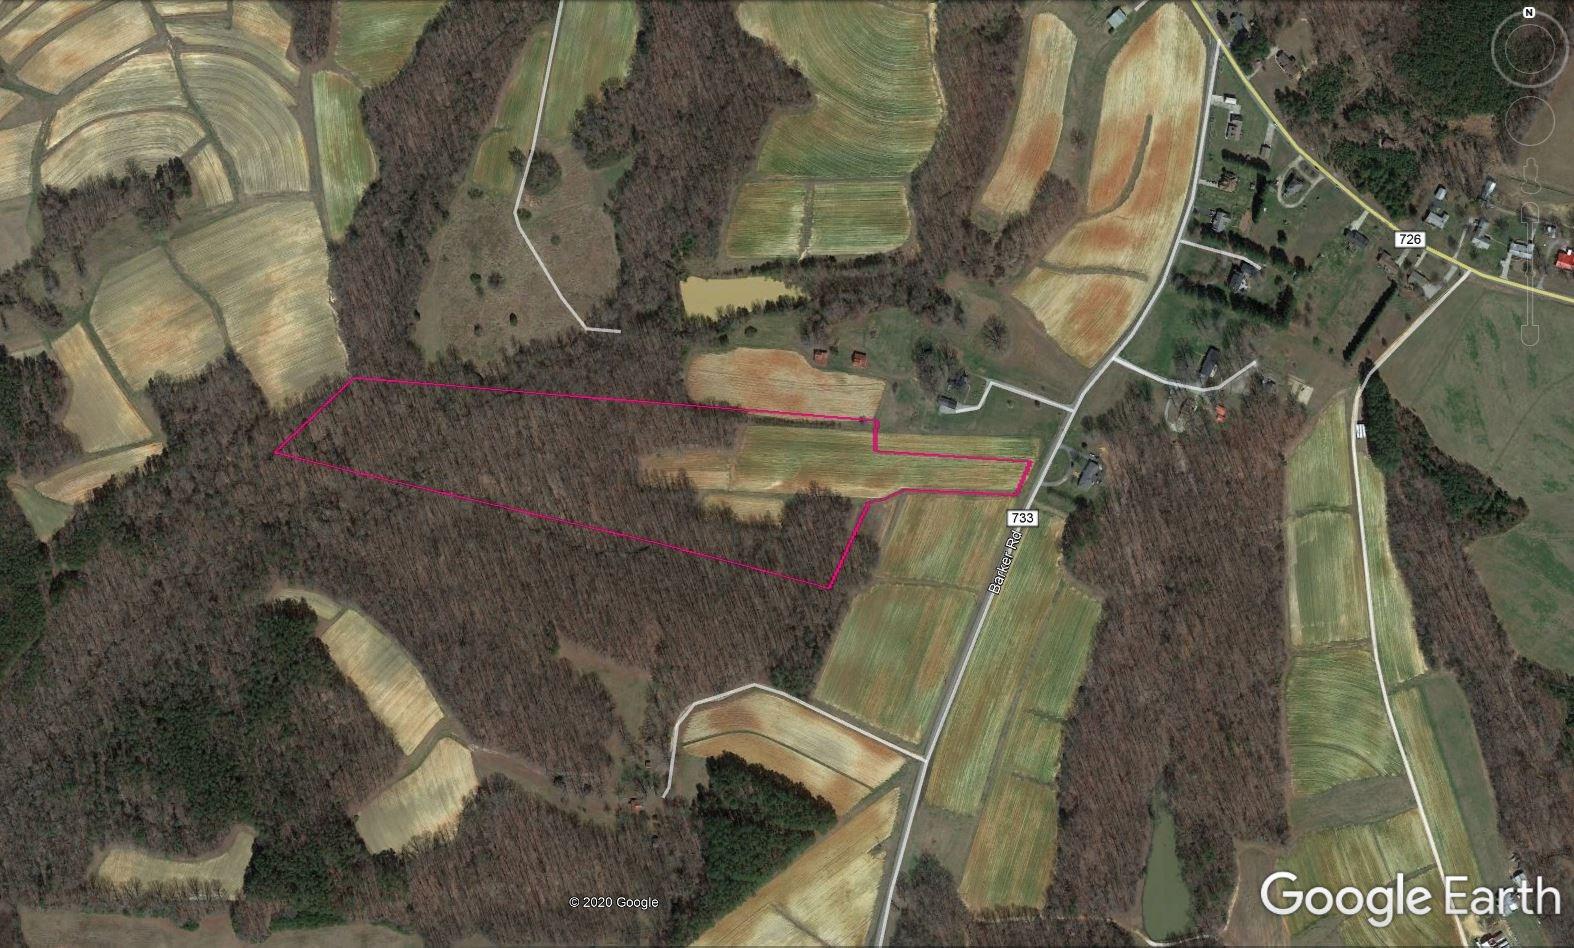 19 +/- acres in Ringgold, VA